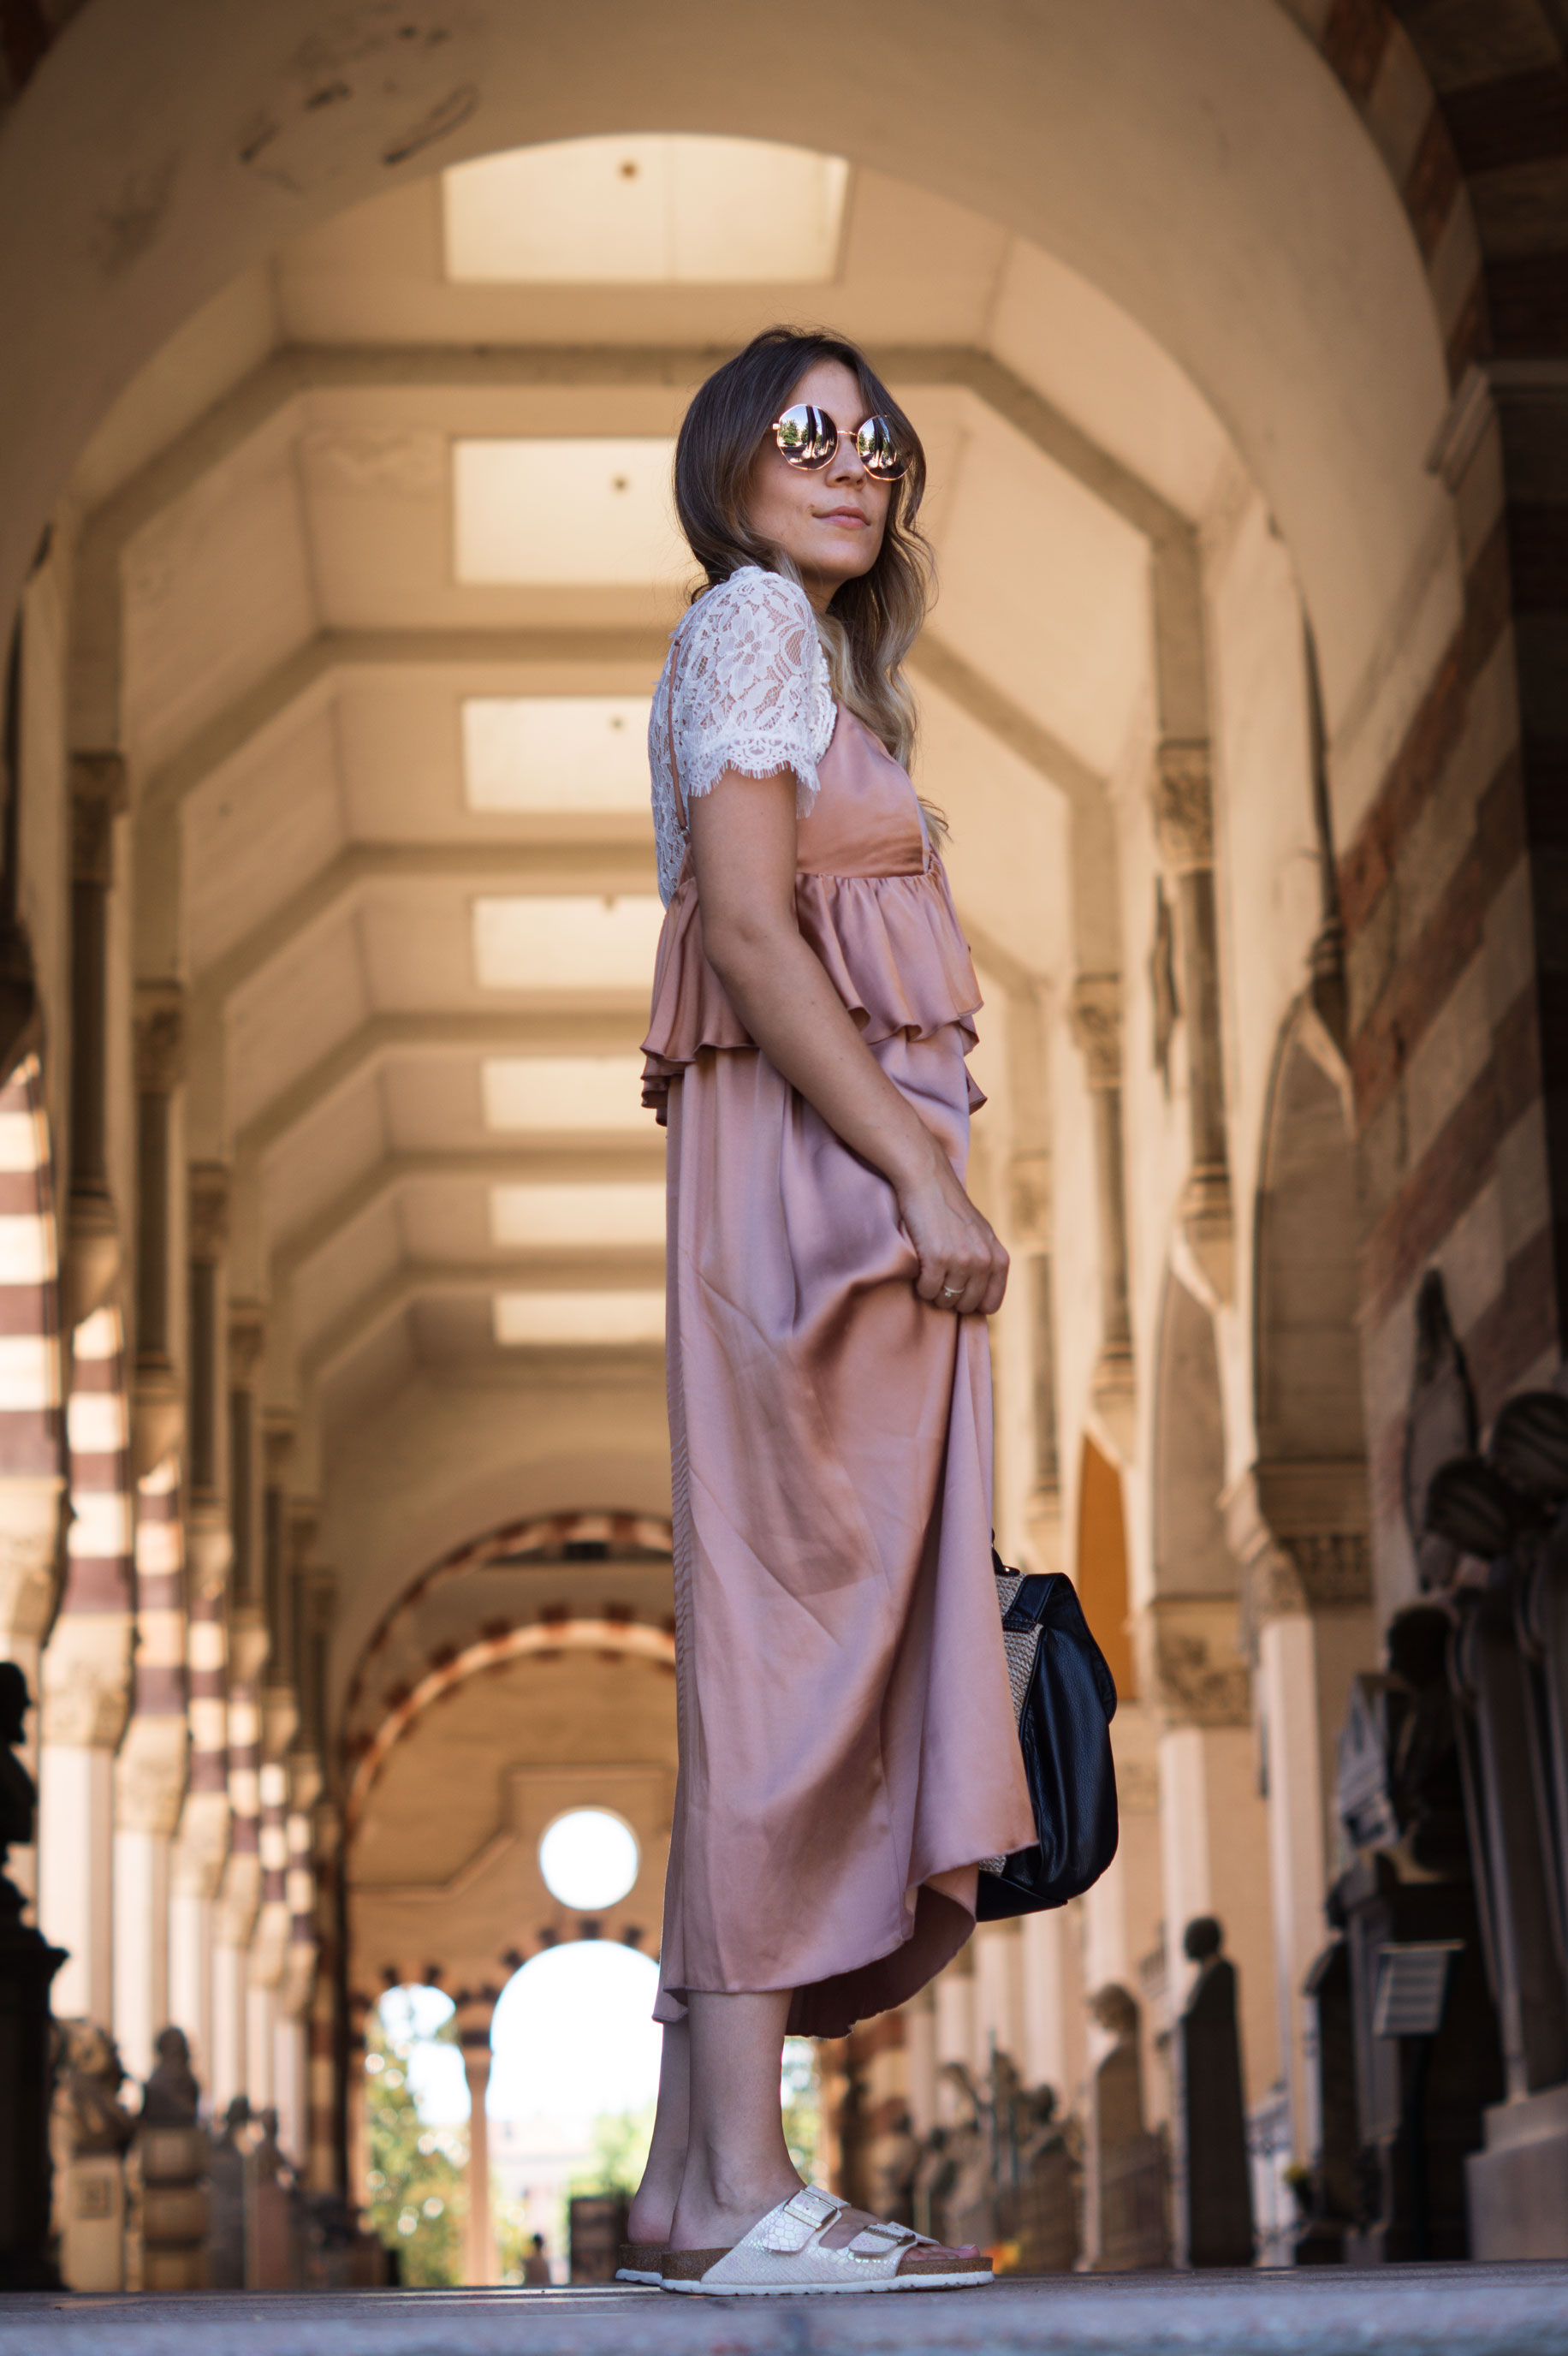 Copper Slipdress rosa Satinkleid silk dress ruffles Rüschenkleid H&M Sariety Modeblog Heidelberg Fashionblogger Milan Mailand Shooting-6